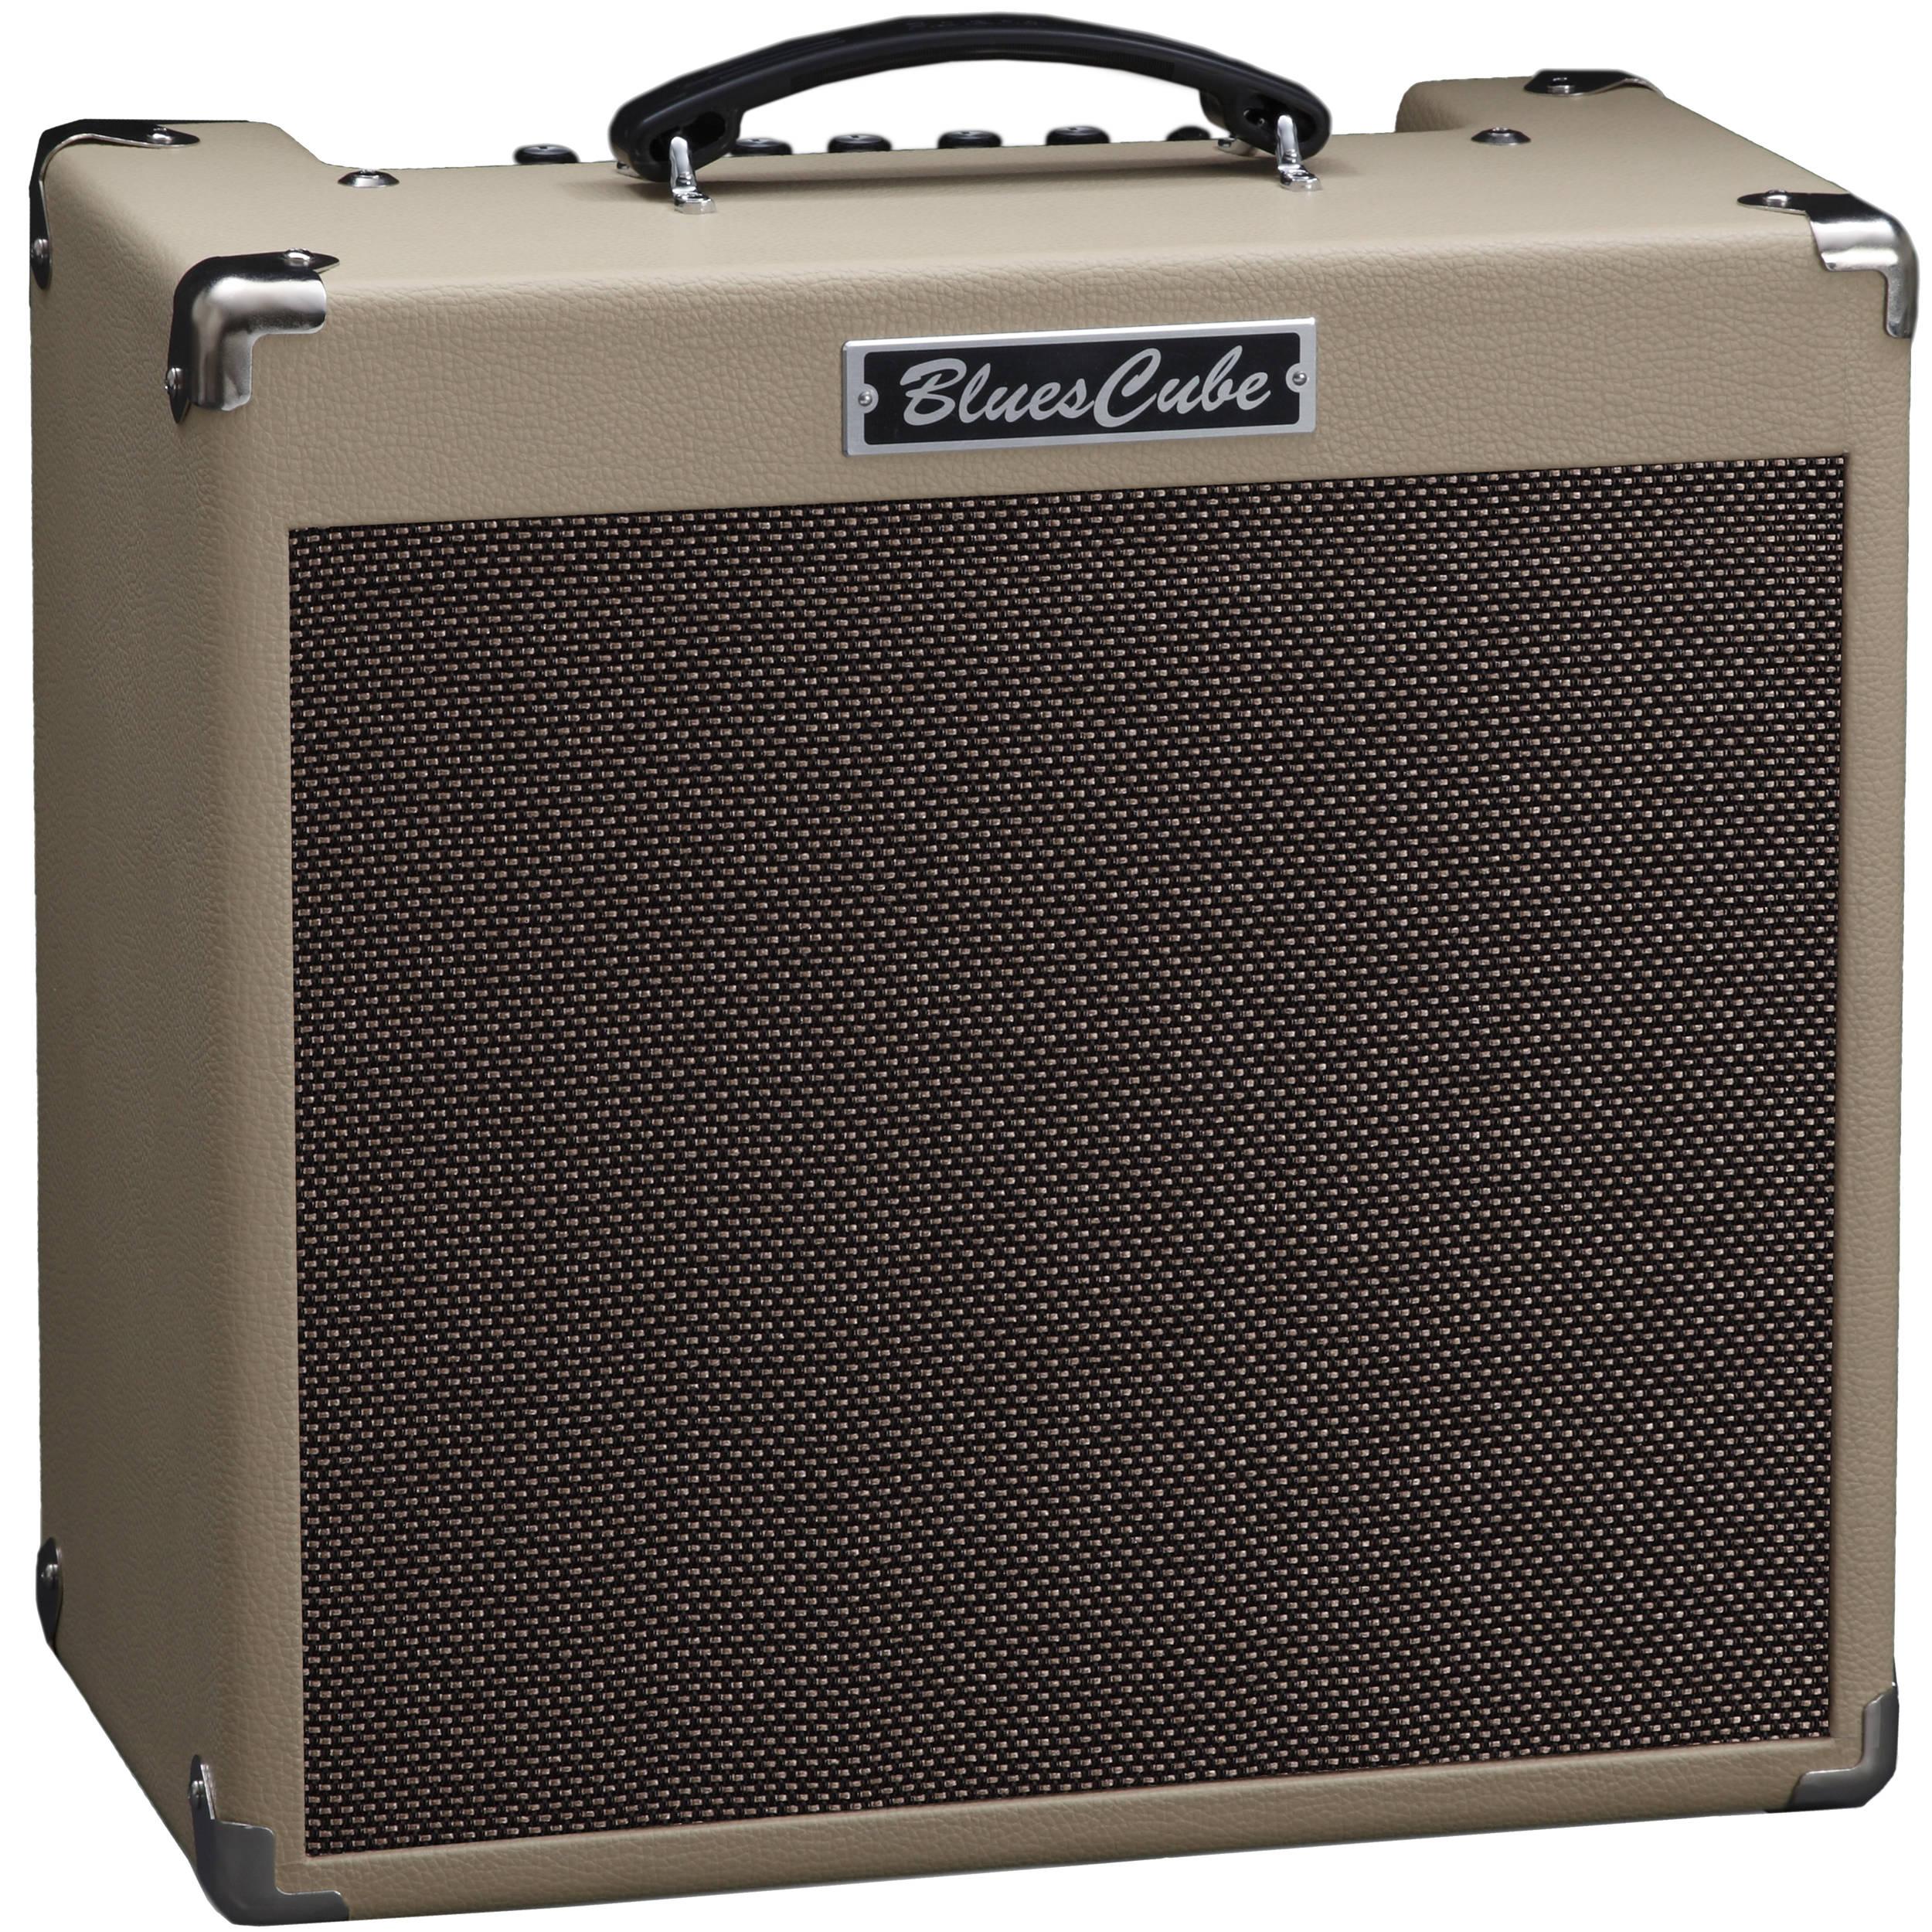 roland blues cube hot 30w 1x12 guitar combo bc hot vb b h. Black Bedroom Furniture Sets. Home Design Ideas